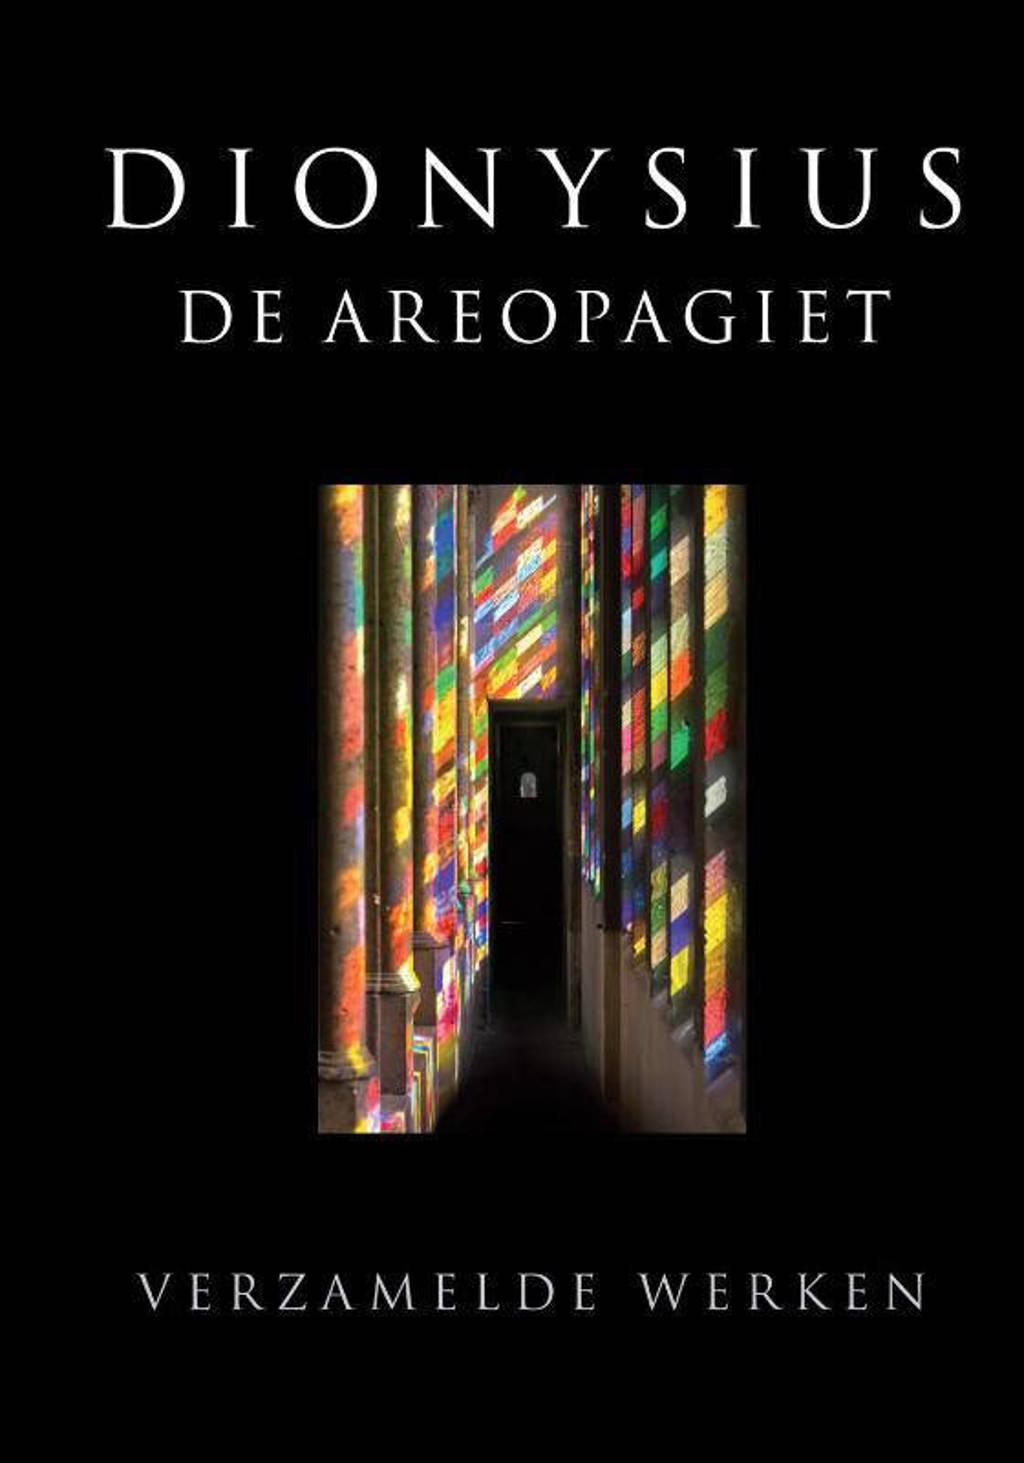 Dionysius de Areopagiet verzamelde werken - Dionysius